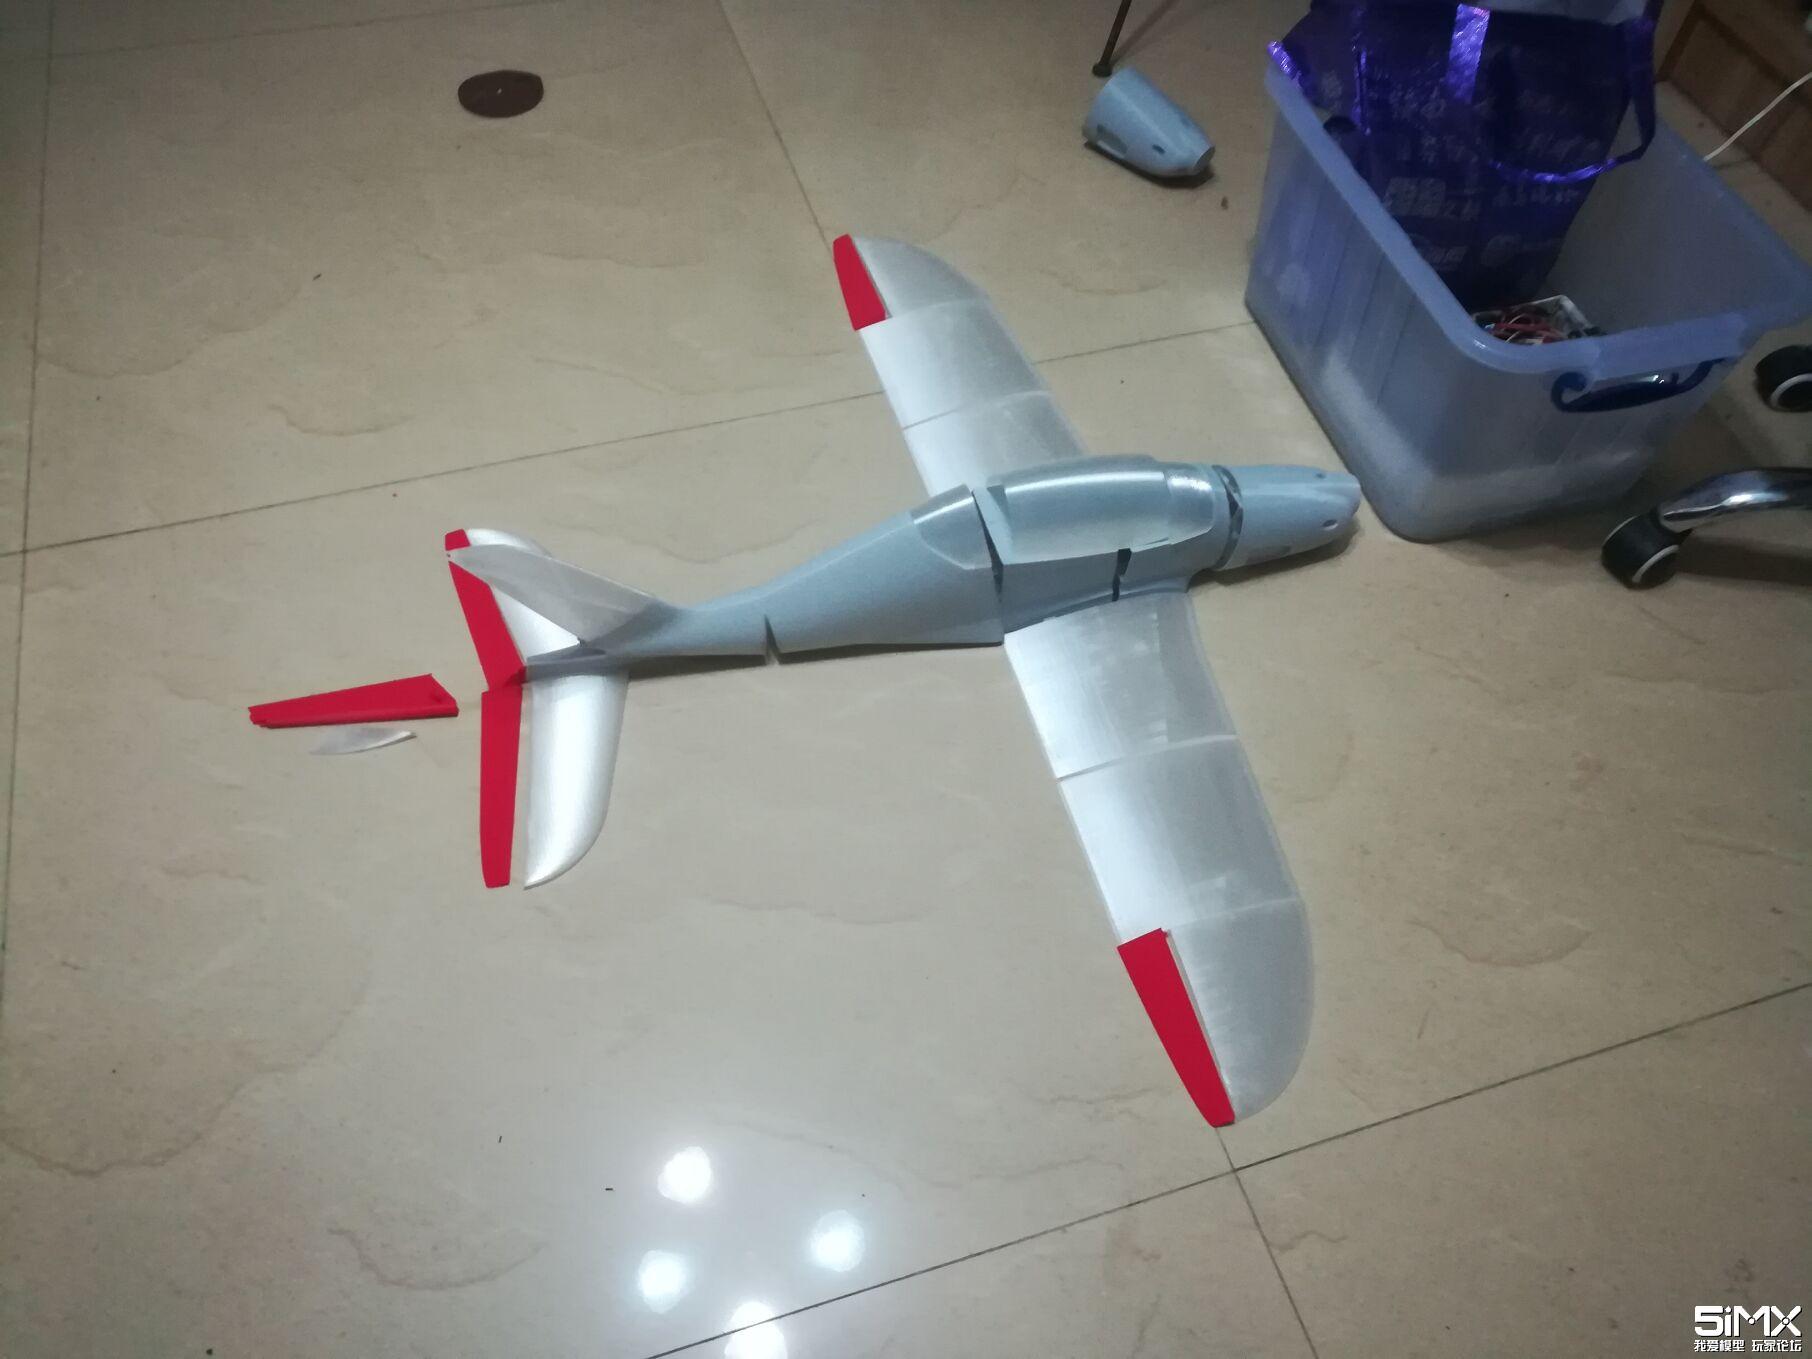 3D打印鲨鱼固定翼飞机 回复邮箱给发整套软件及STL文件